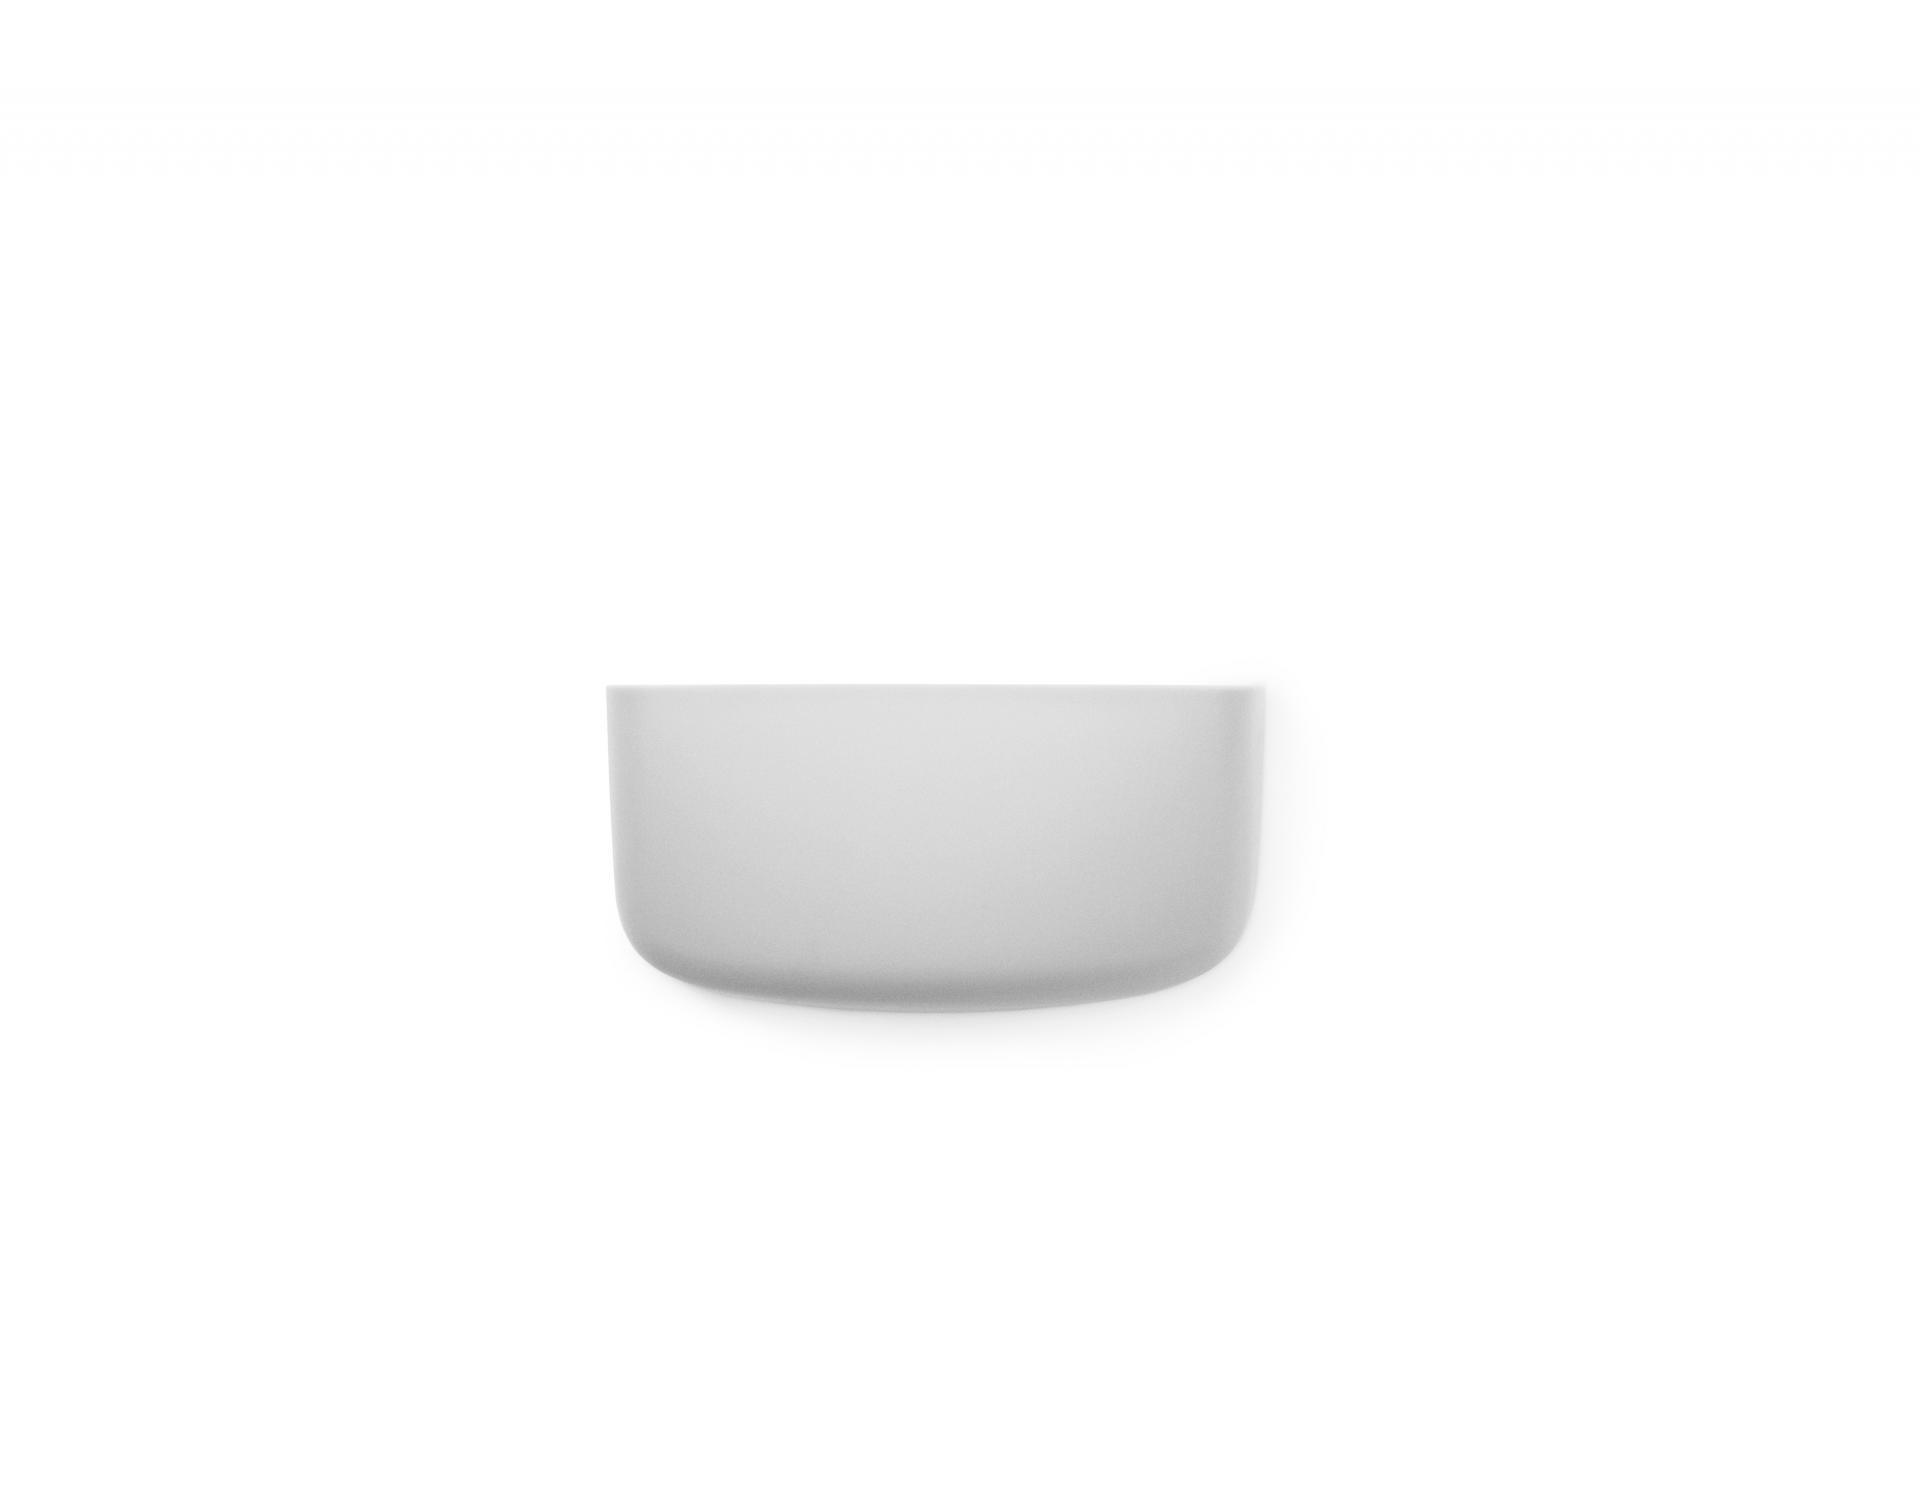 normann COPENHAGEN Nástěnný organizér Light Grey Pocket 1, šedá barva, plast